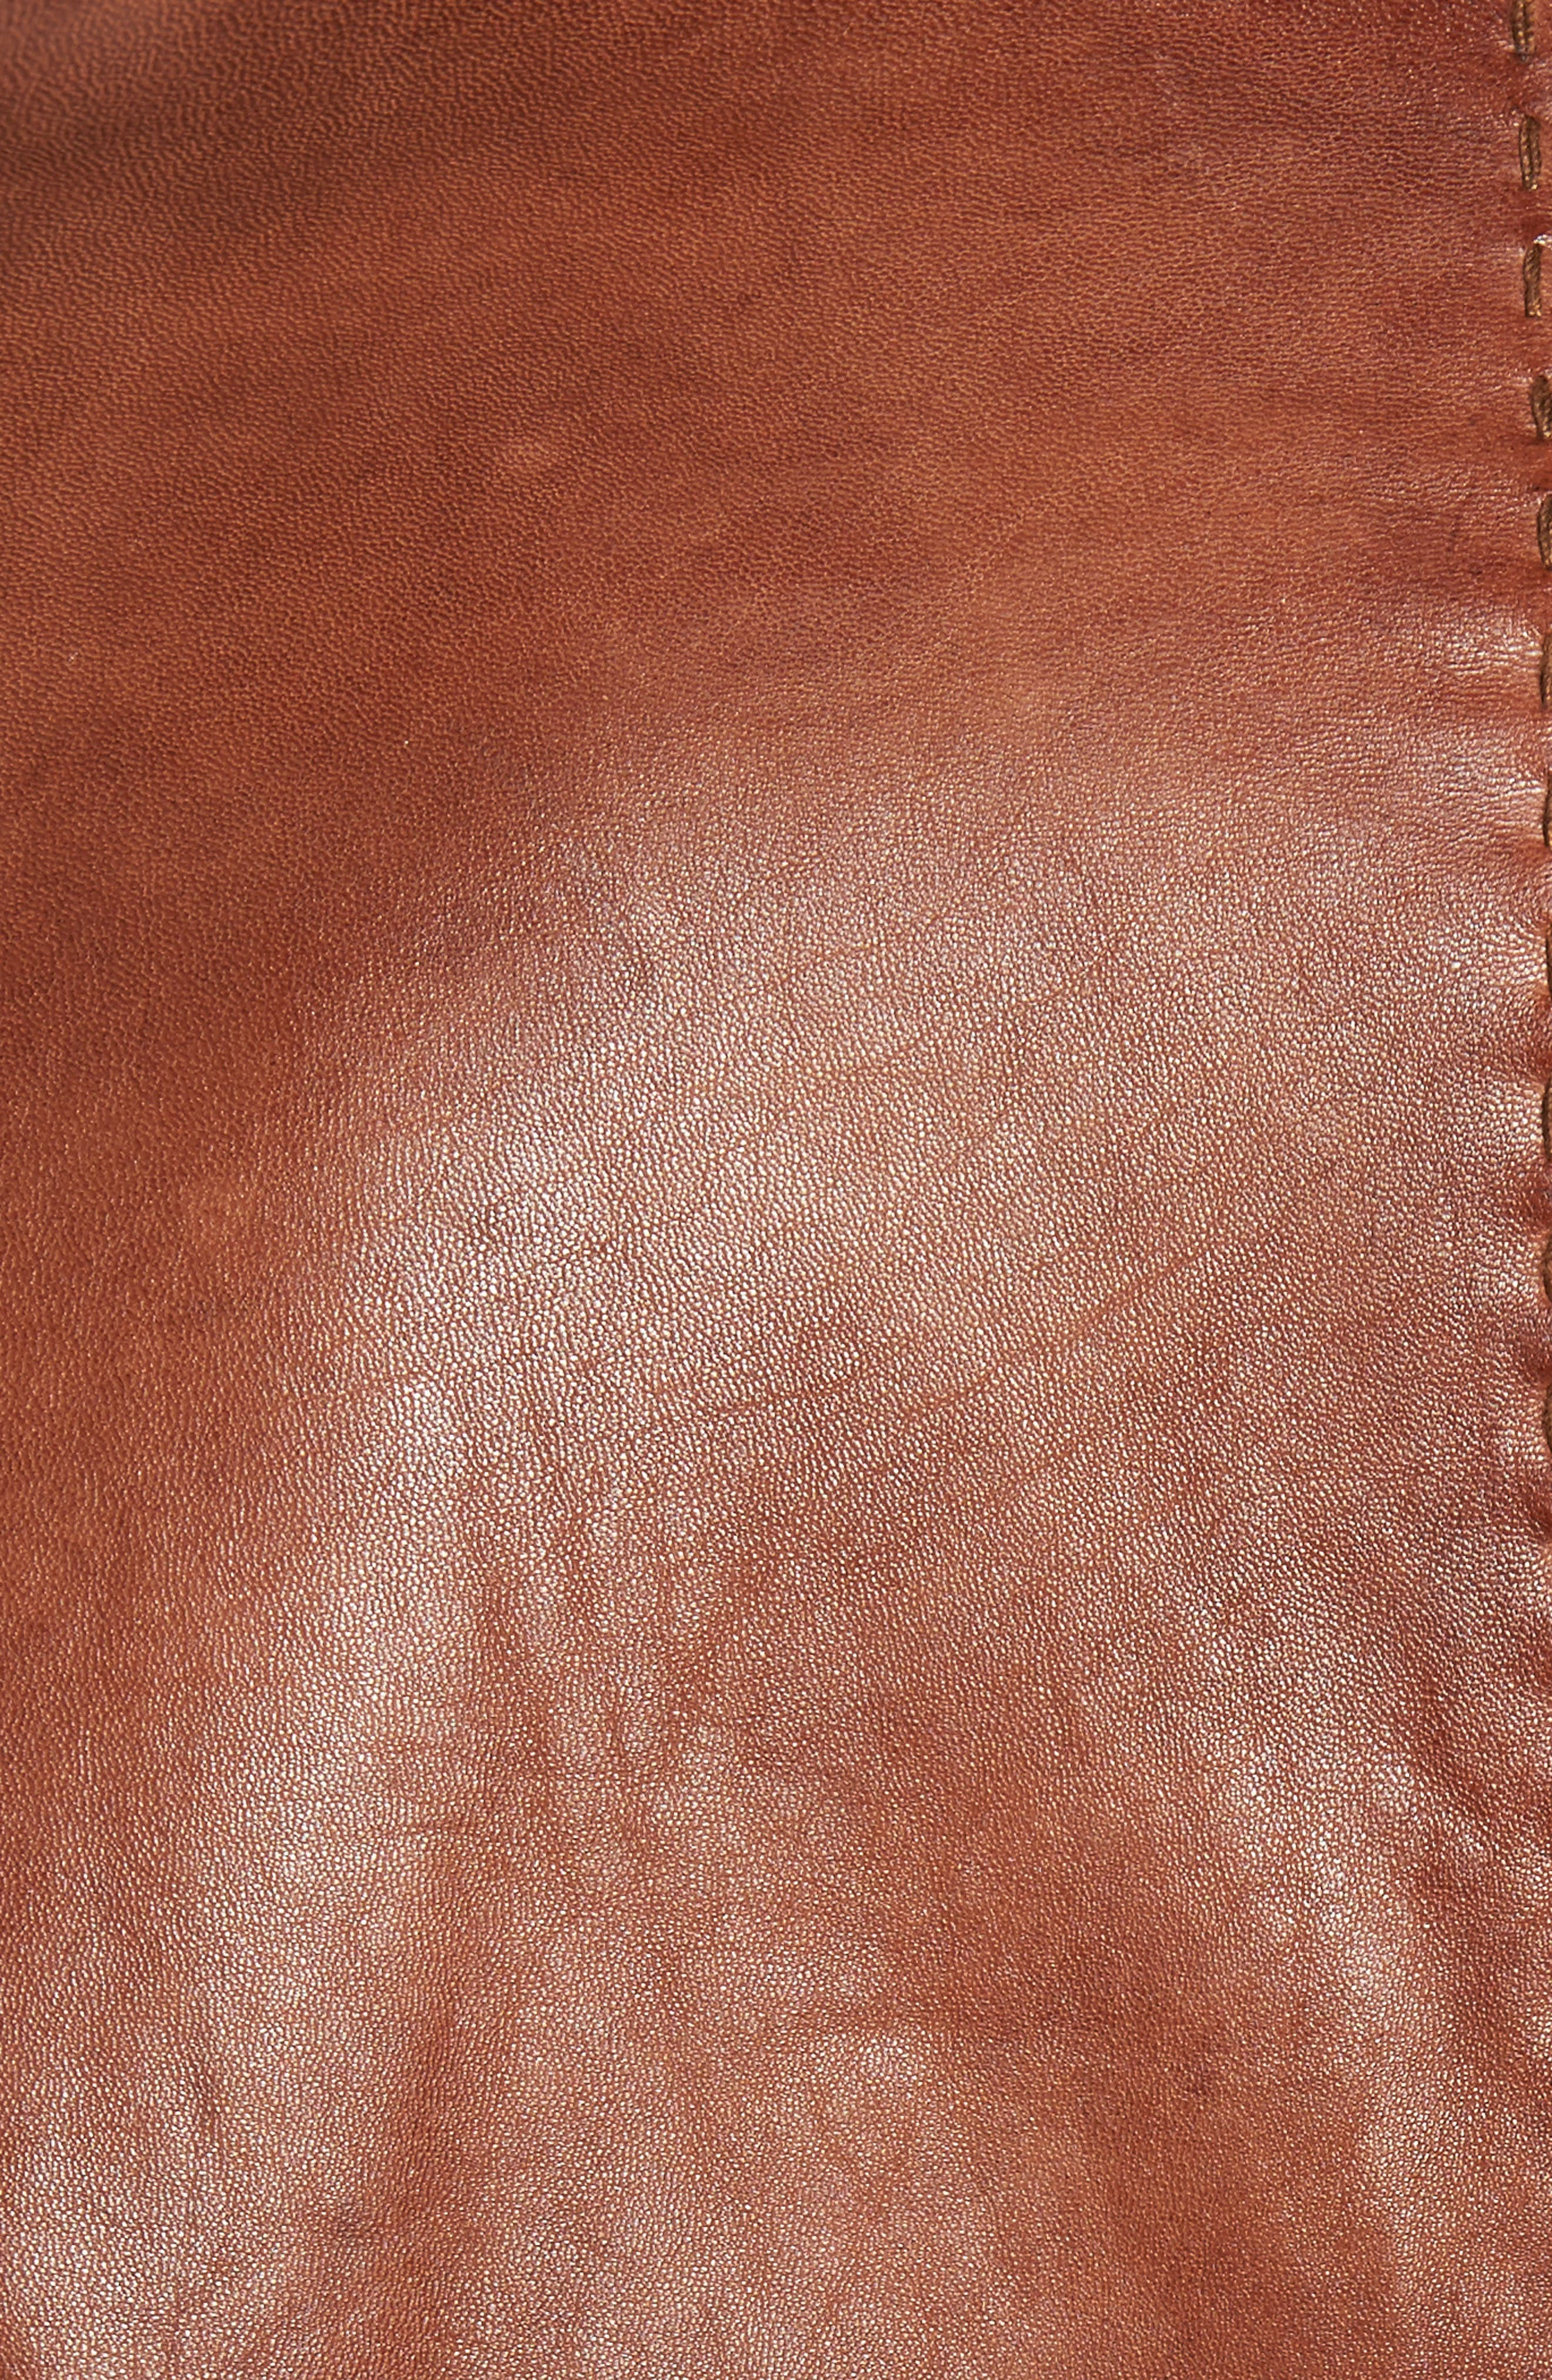 Lamb Leather Blazer,                             Alternate thumbnail 5, color,                             210